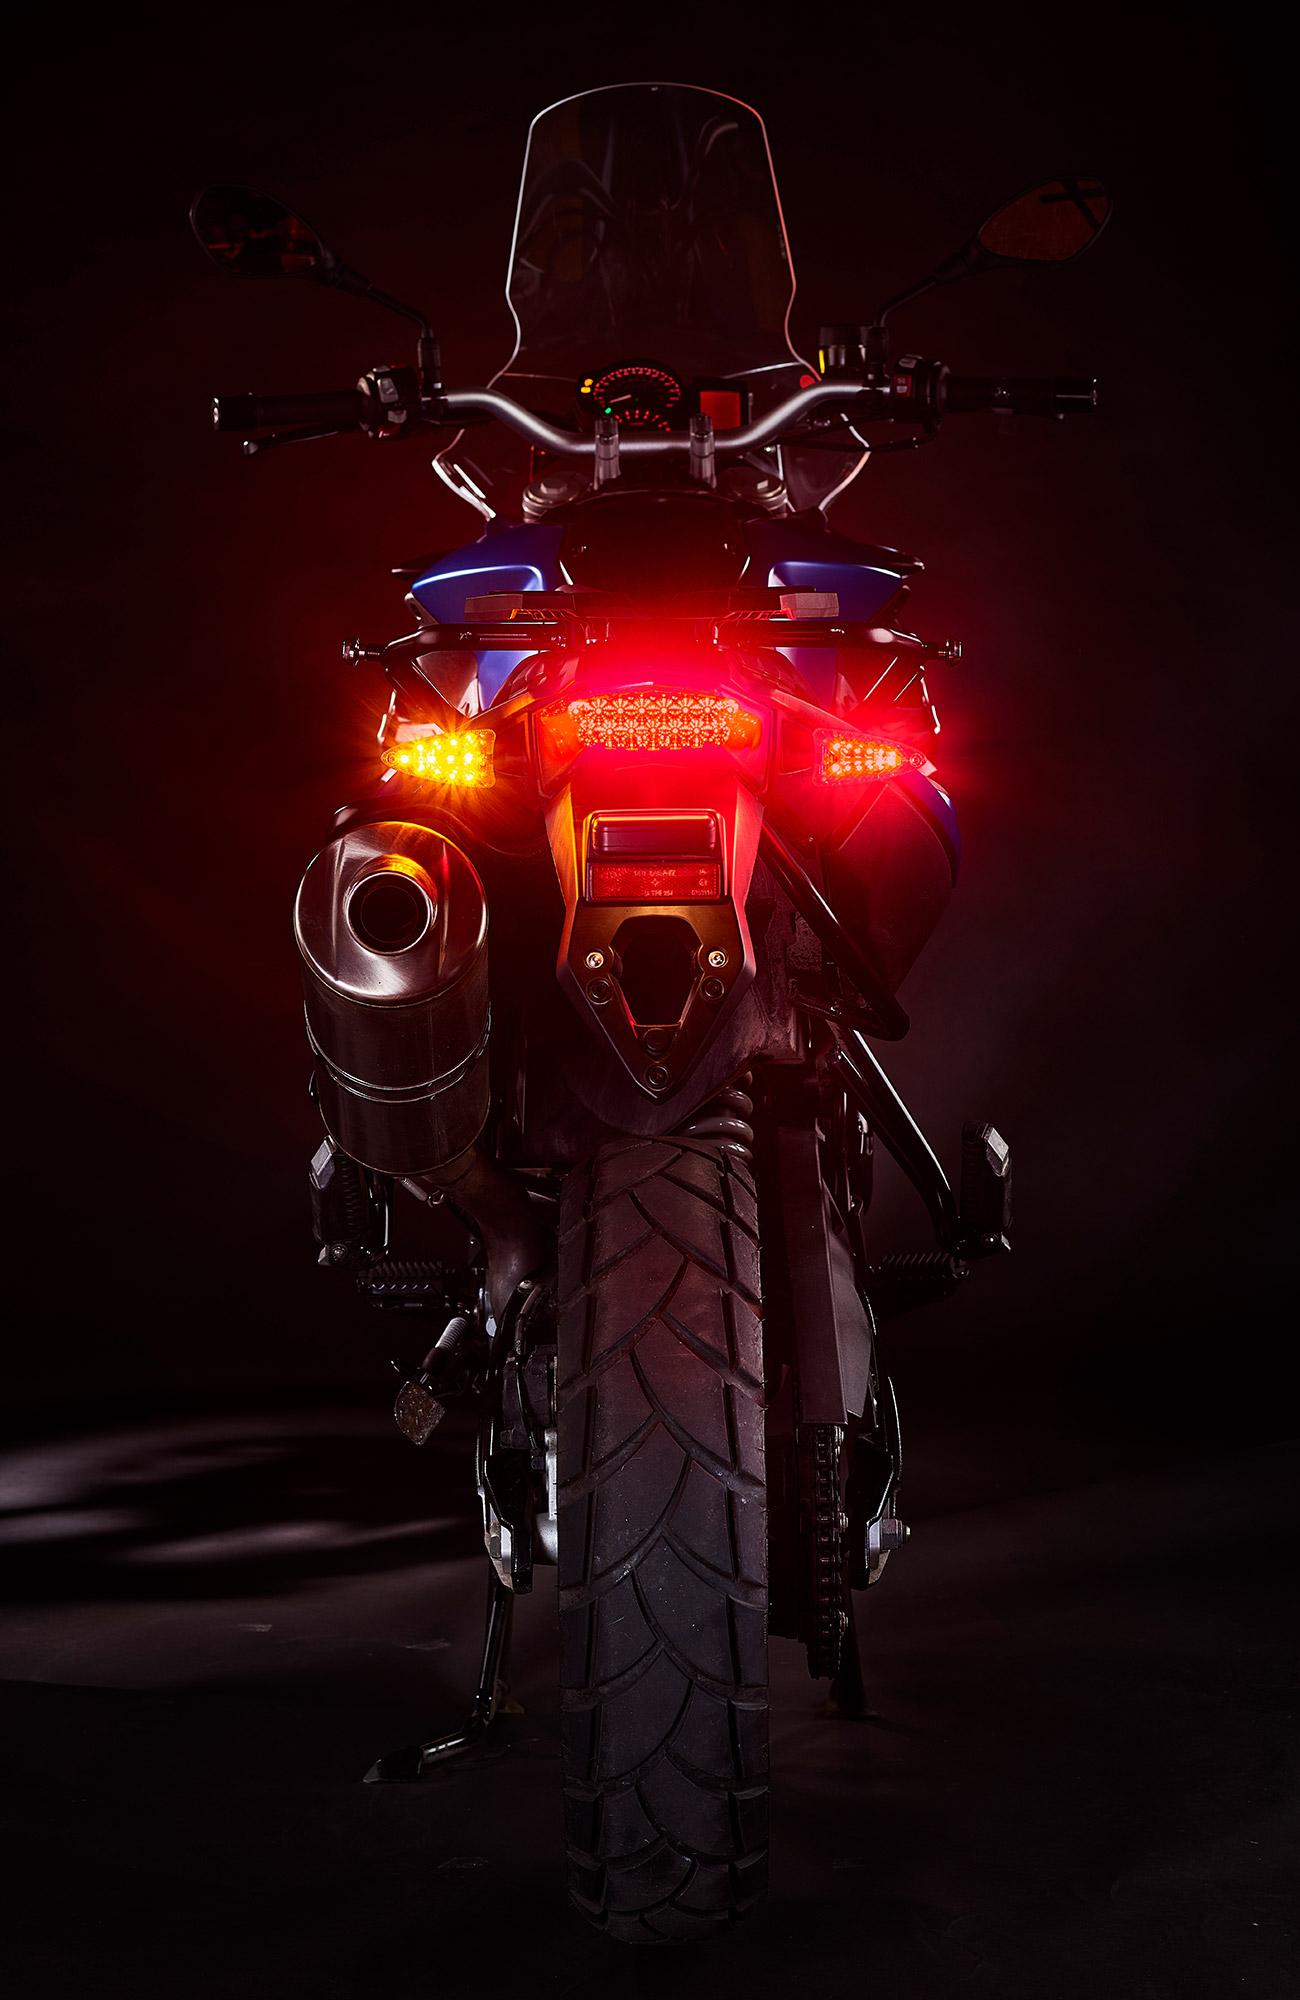 2-in-1-ultrabrights-brake-turn-newBMWs-2 (web).jpg